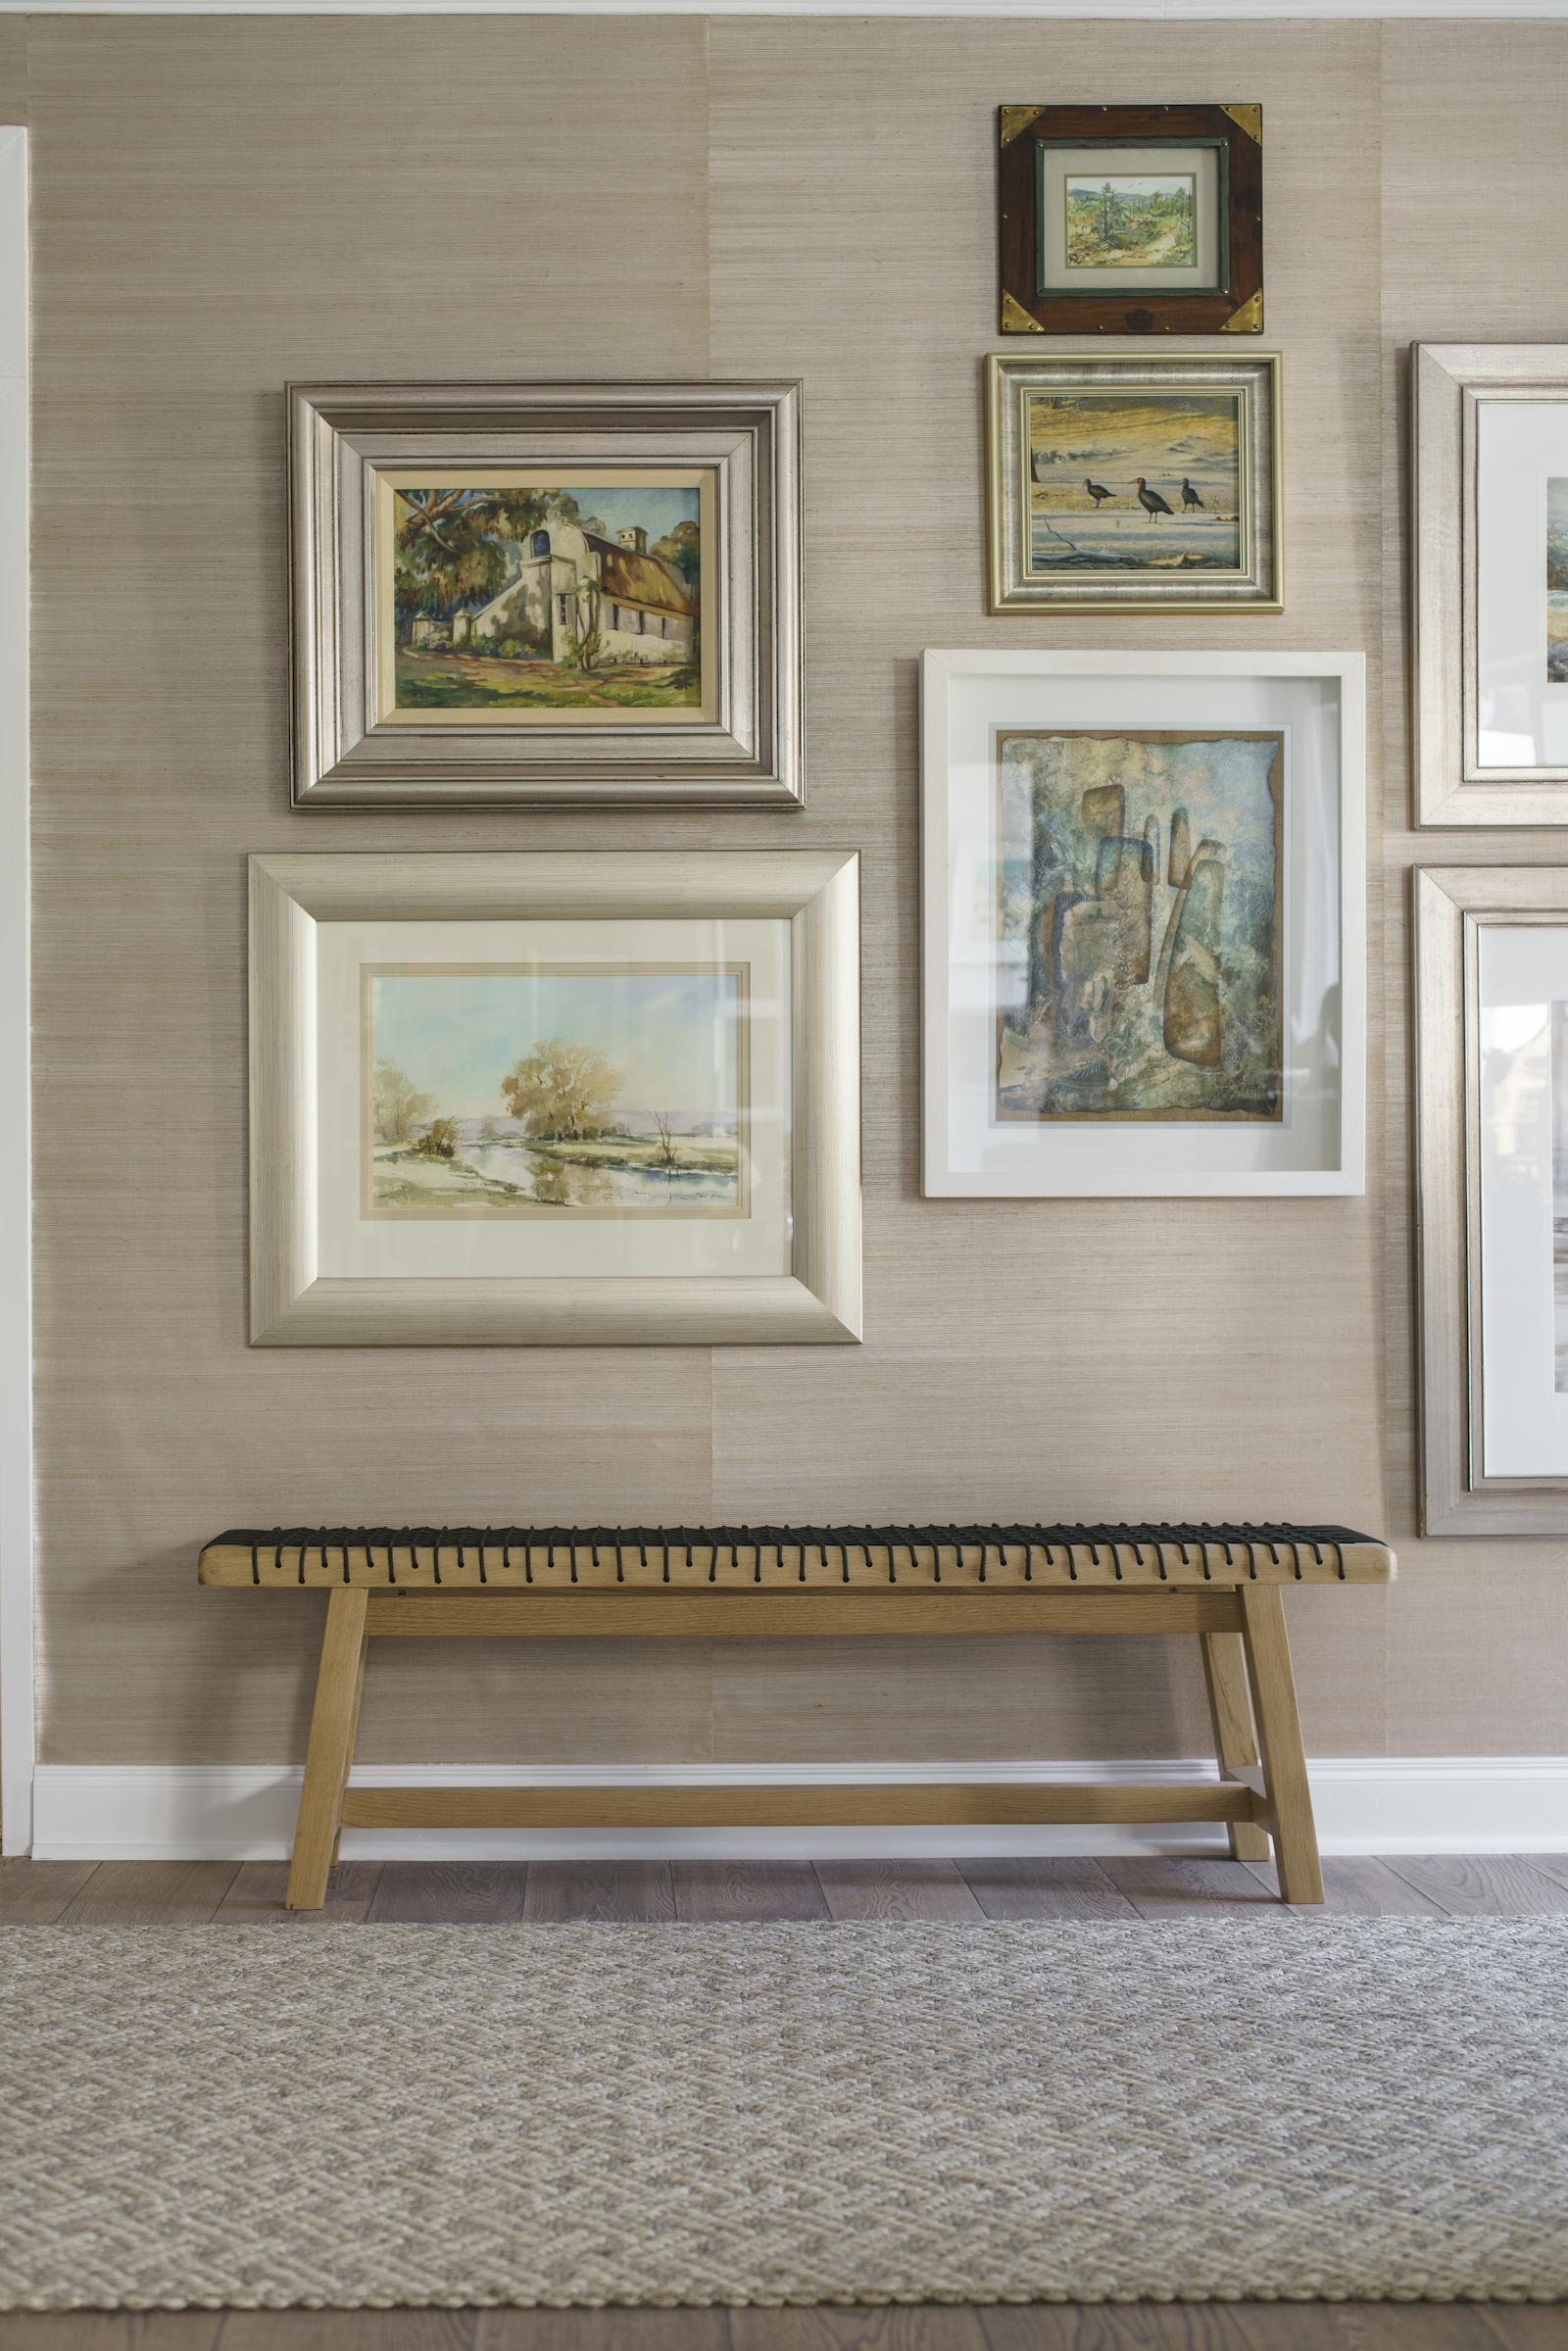 Heritage Home Design Johannesburg049